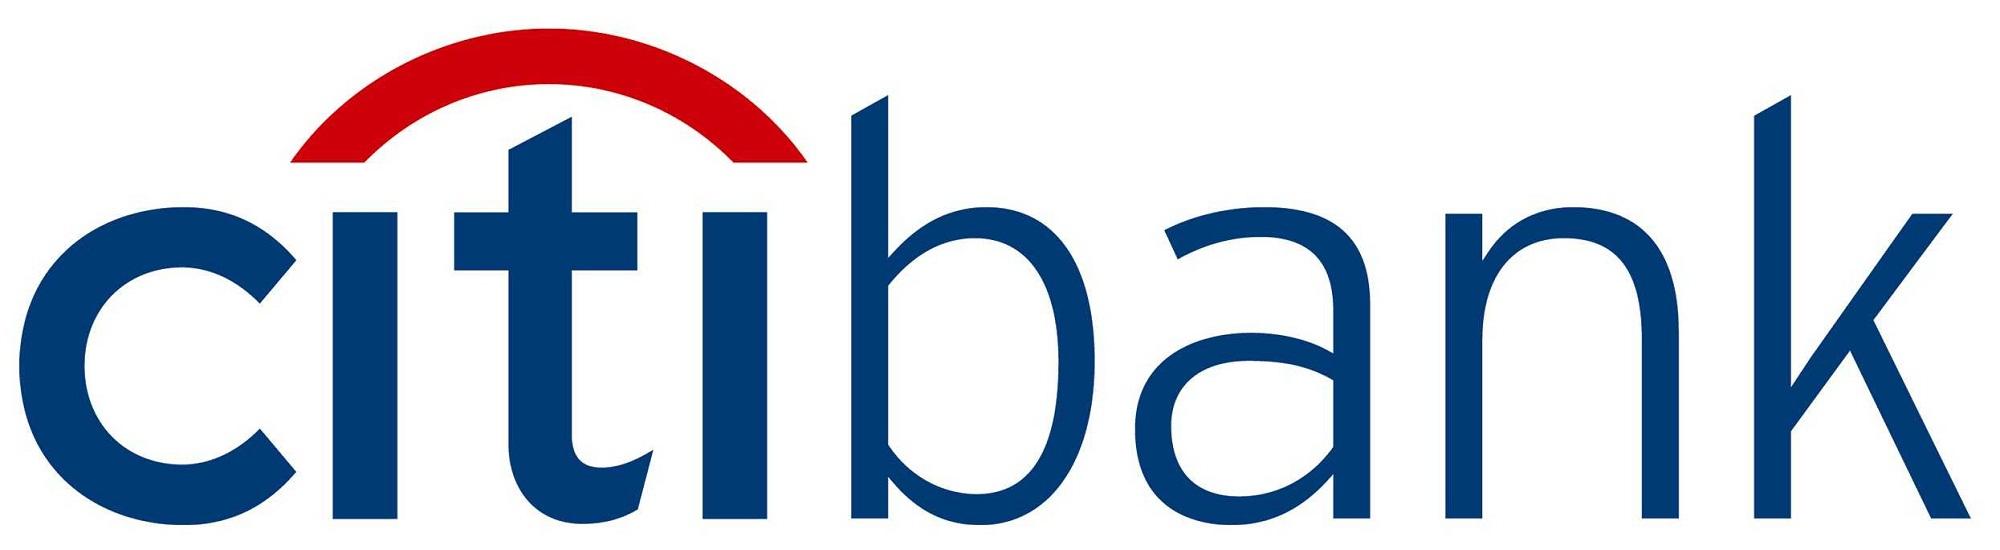 Citibank Logo Image